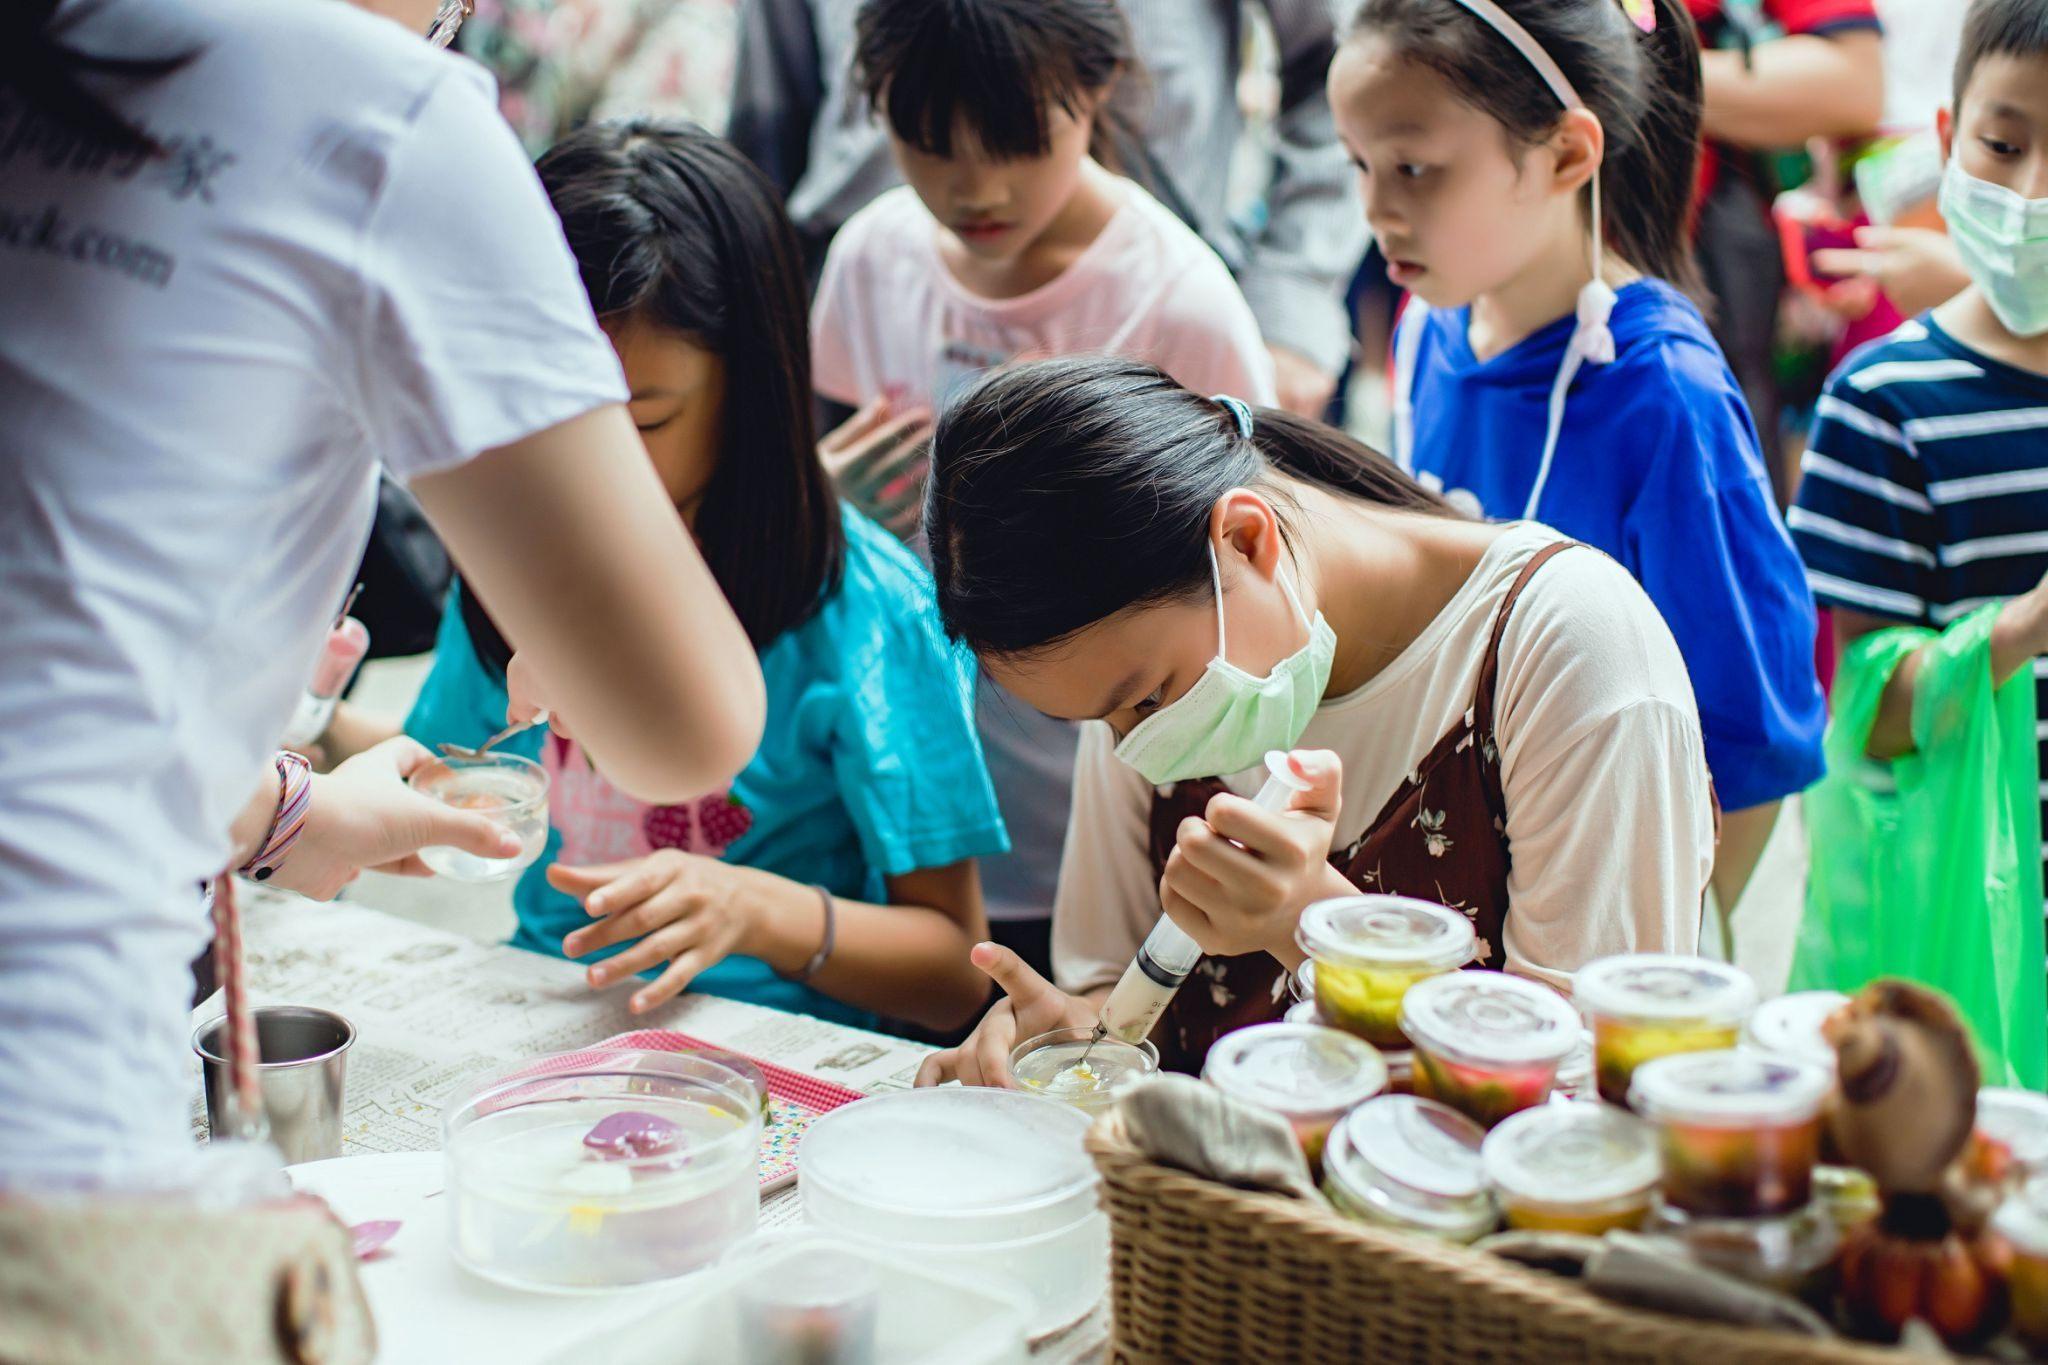 10-Antusias pengunjung ketika membuat DIY jelly 3D